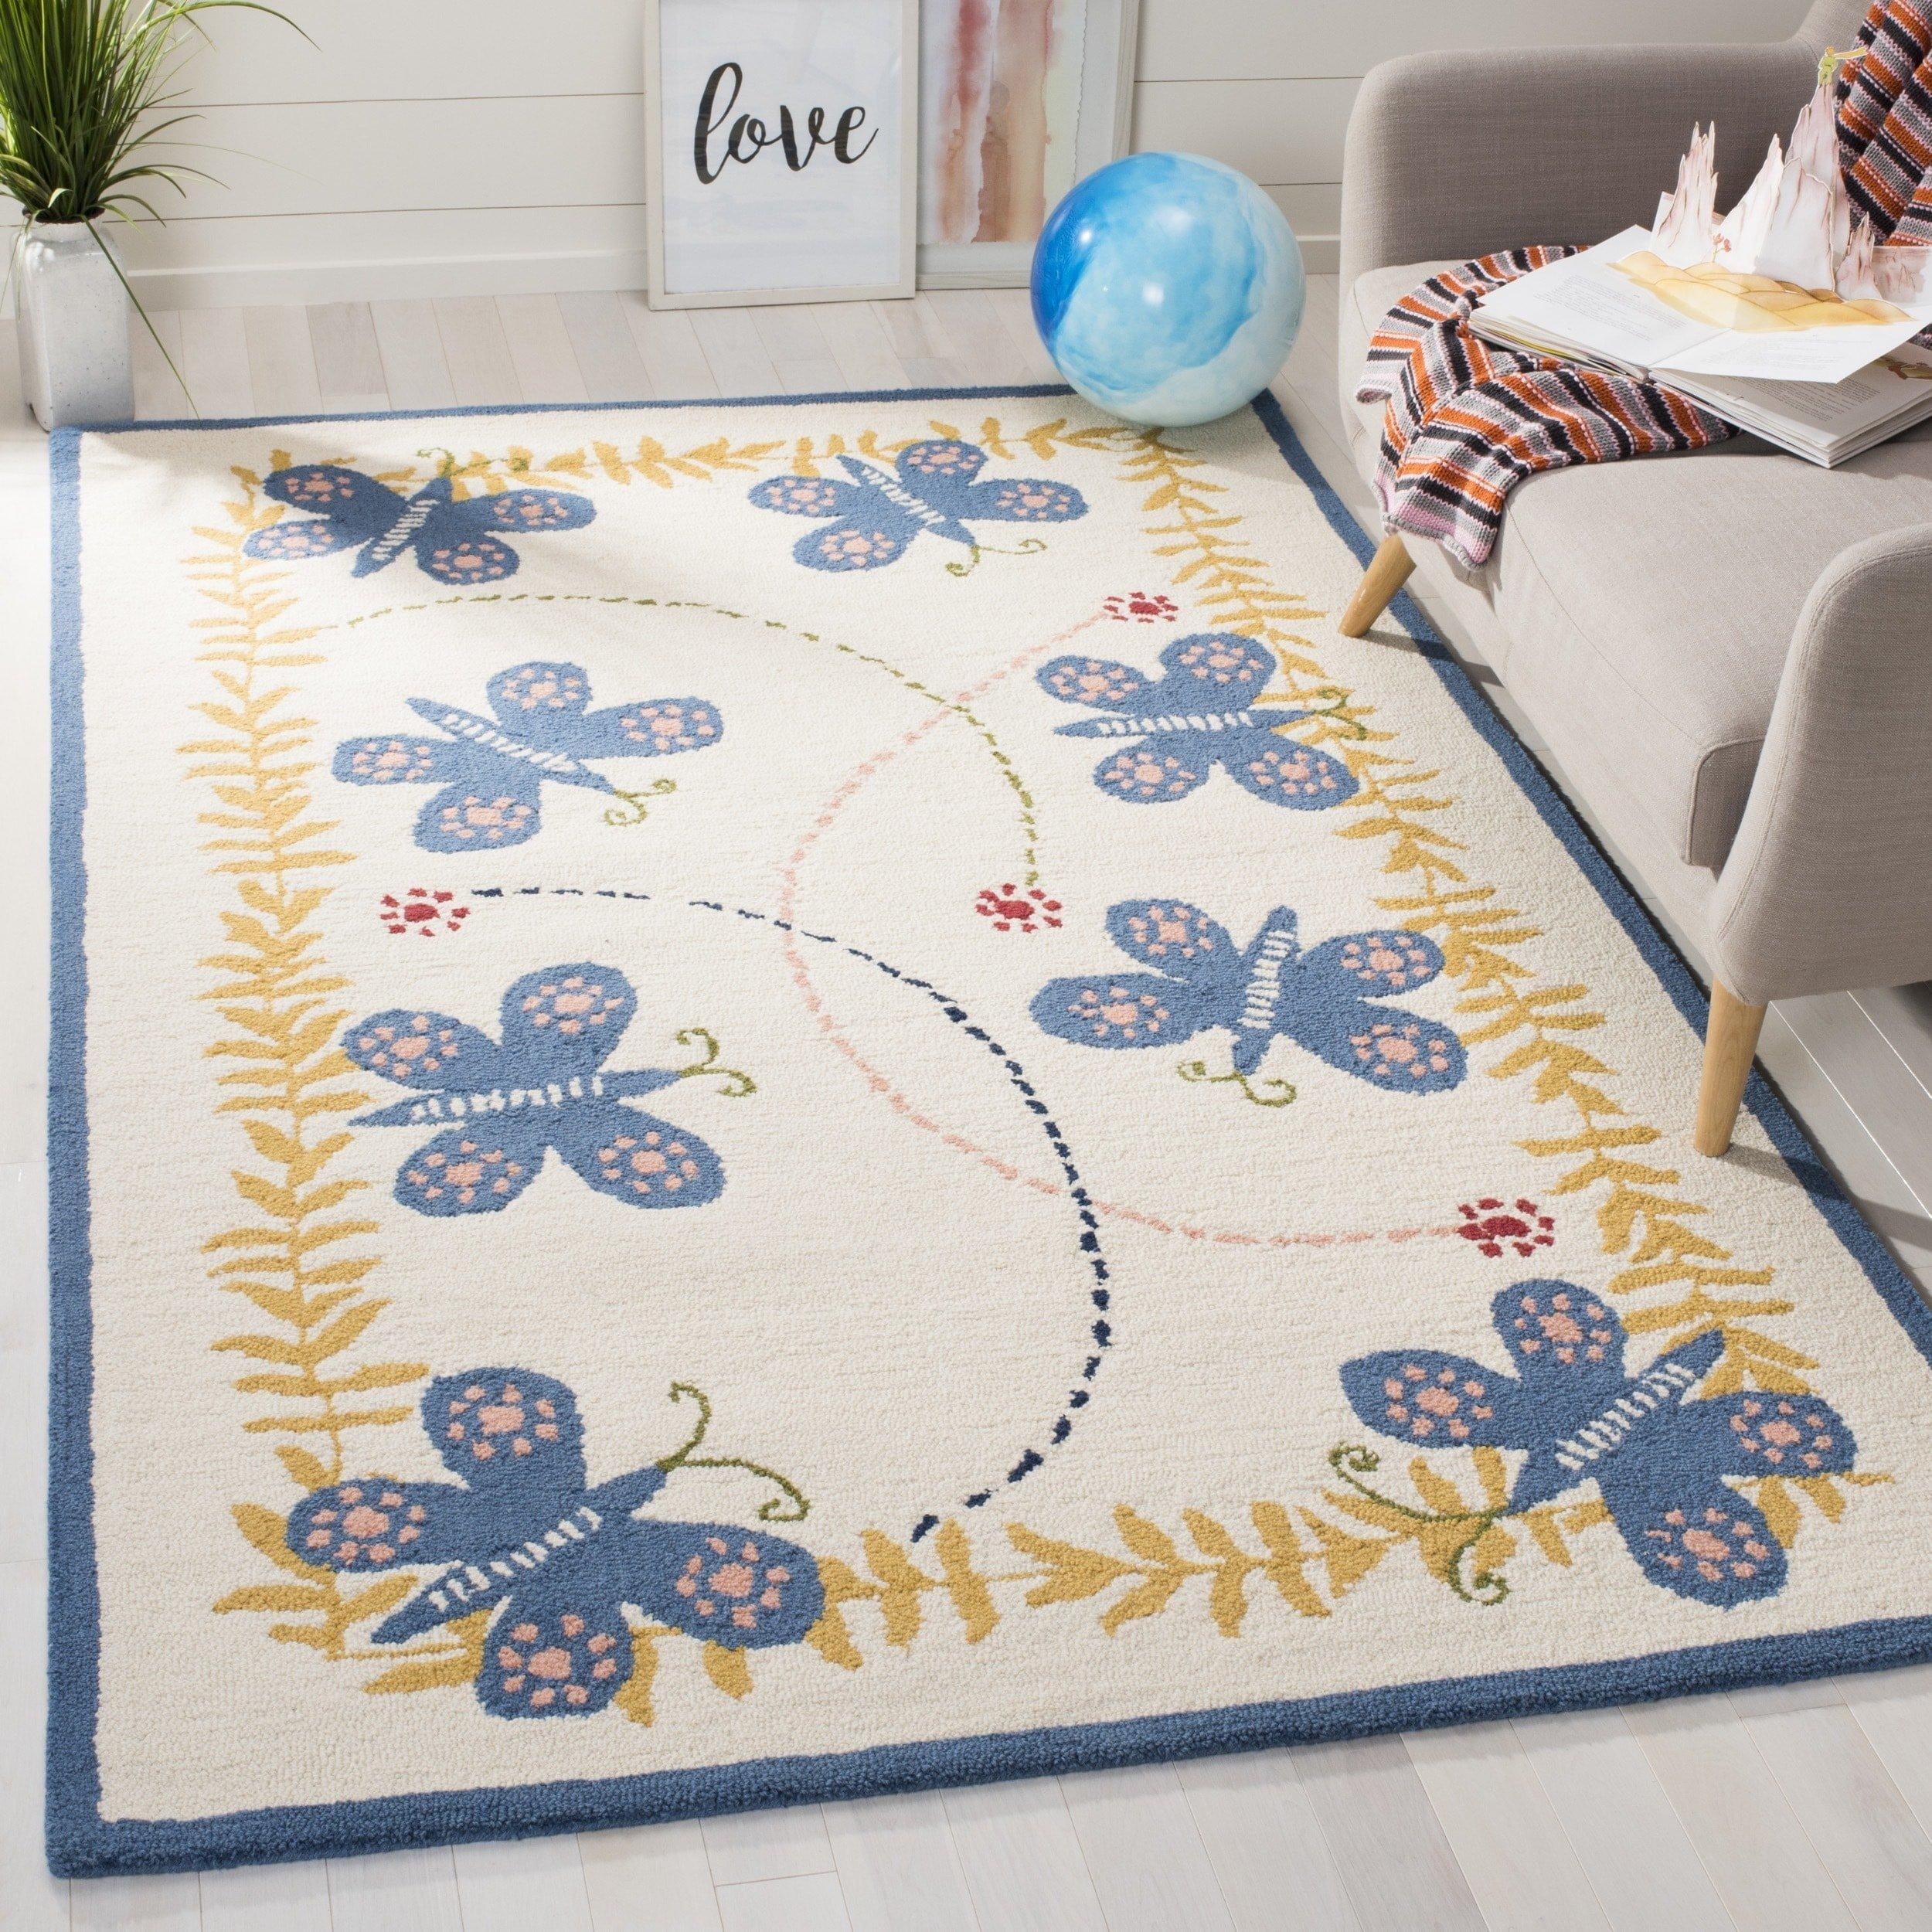 Safavieh Safavieh Kids Collection SFK390A Handmade Ivory and Blue Cotton Area Rug (5' x 8')